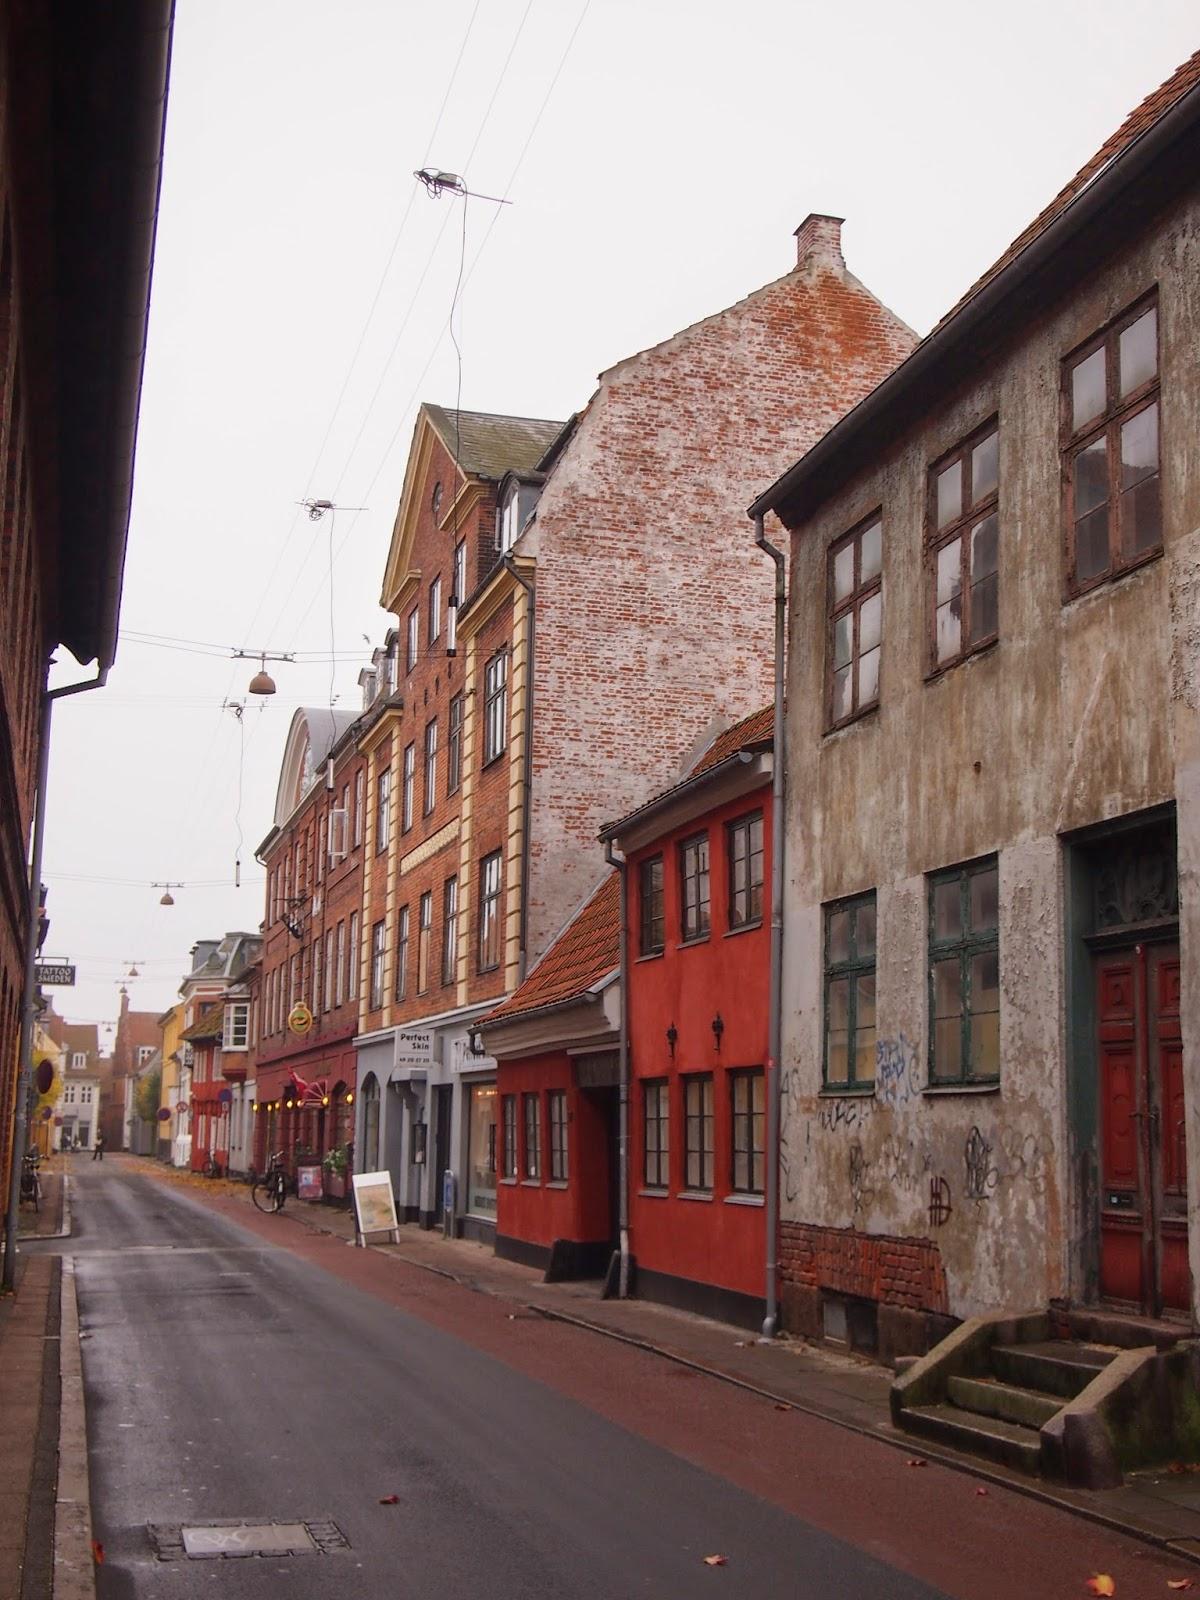 Helsignor town